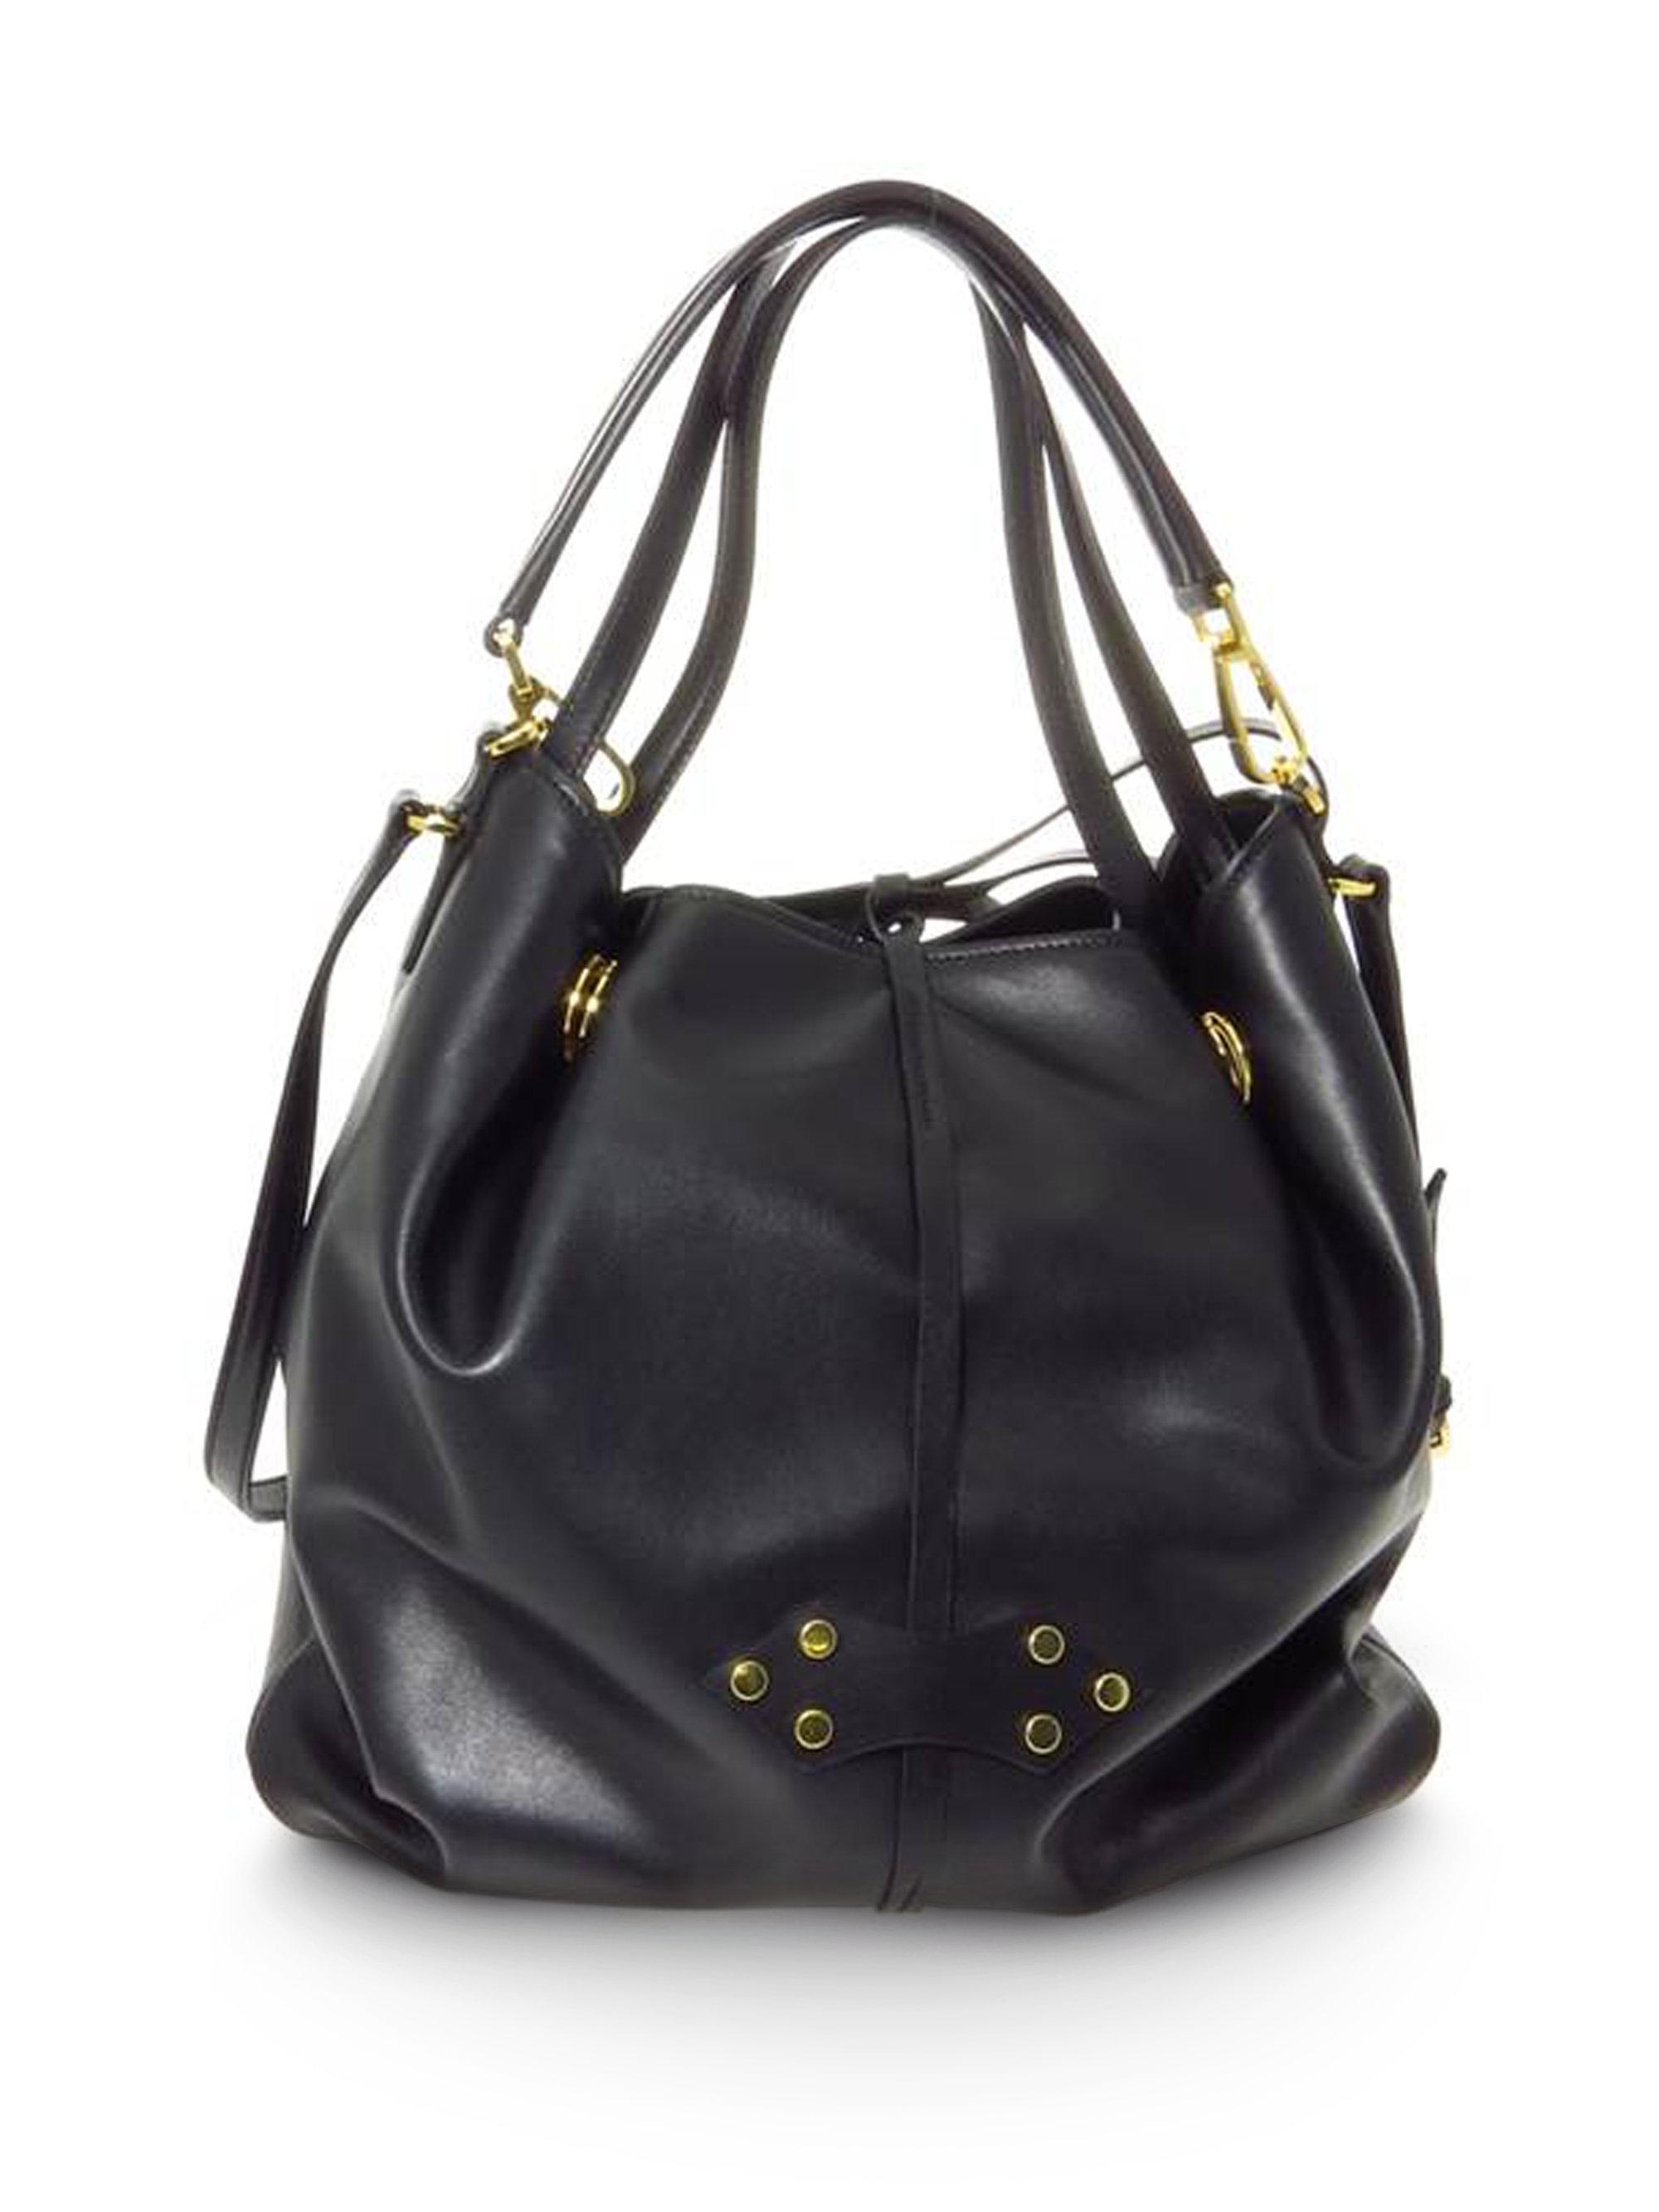 Lyst miu large vitello soft bucket bag in black jpg 2000x2667 Miu vitello  bags aa88a9b93e